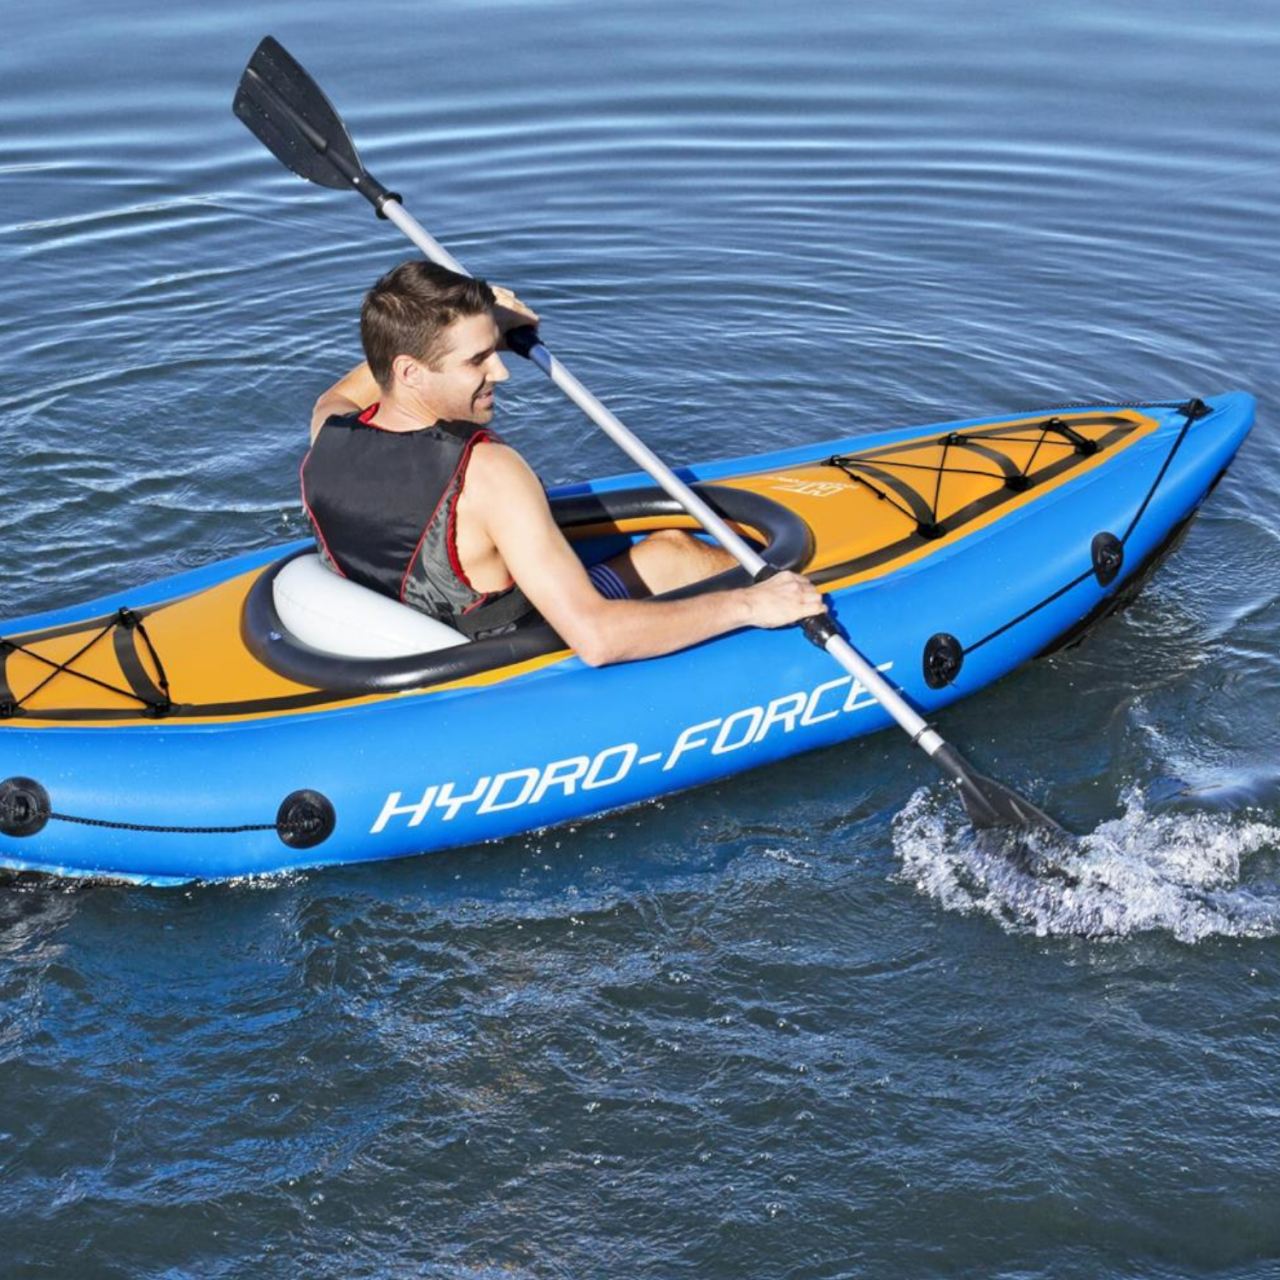 Bestway 65115 Hydro-Force Kajak-Set Cove Champion Aufblasbares Boot 275x81x45cm